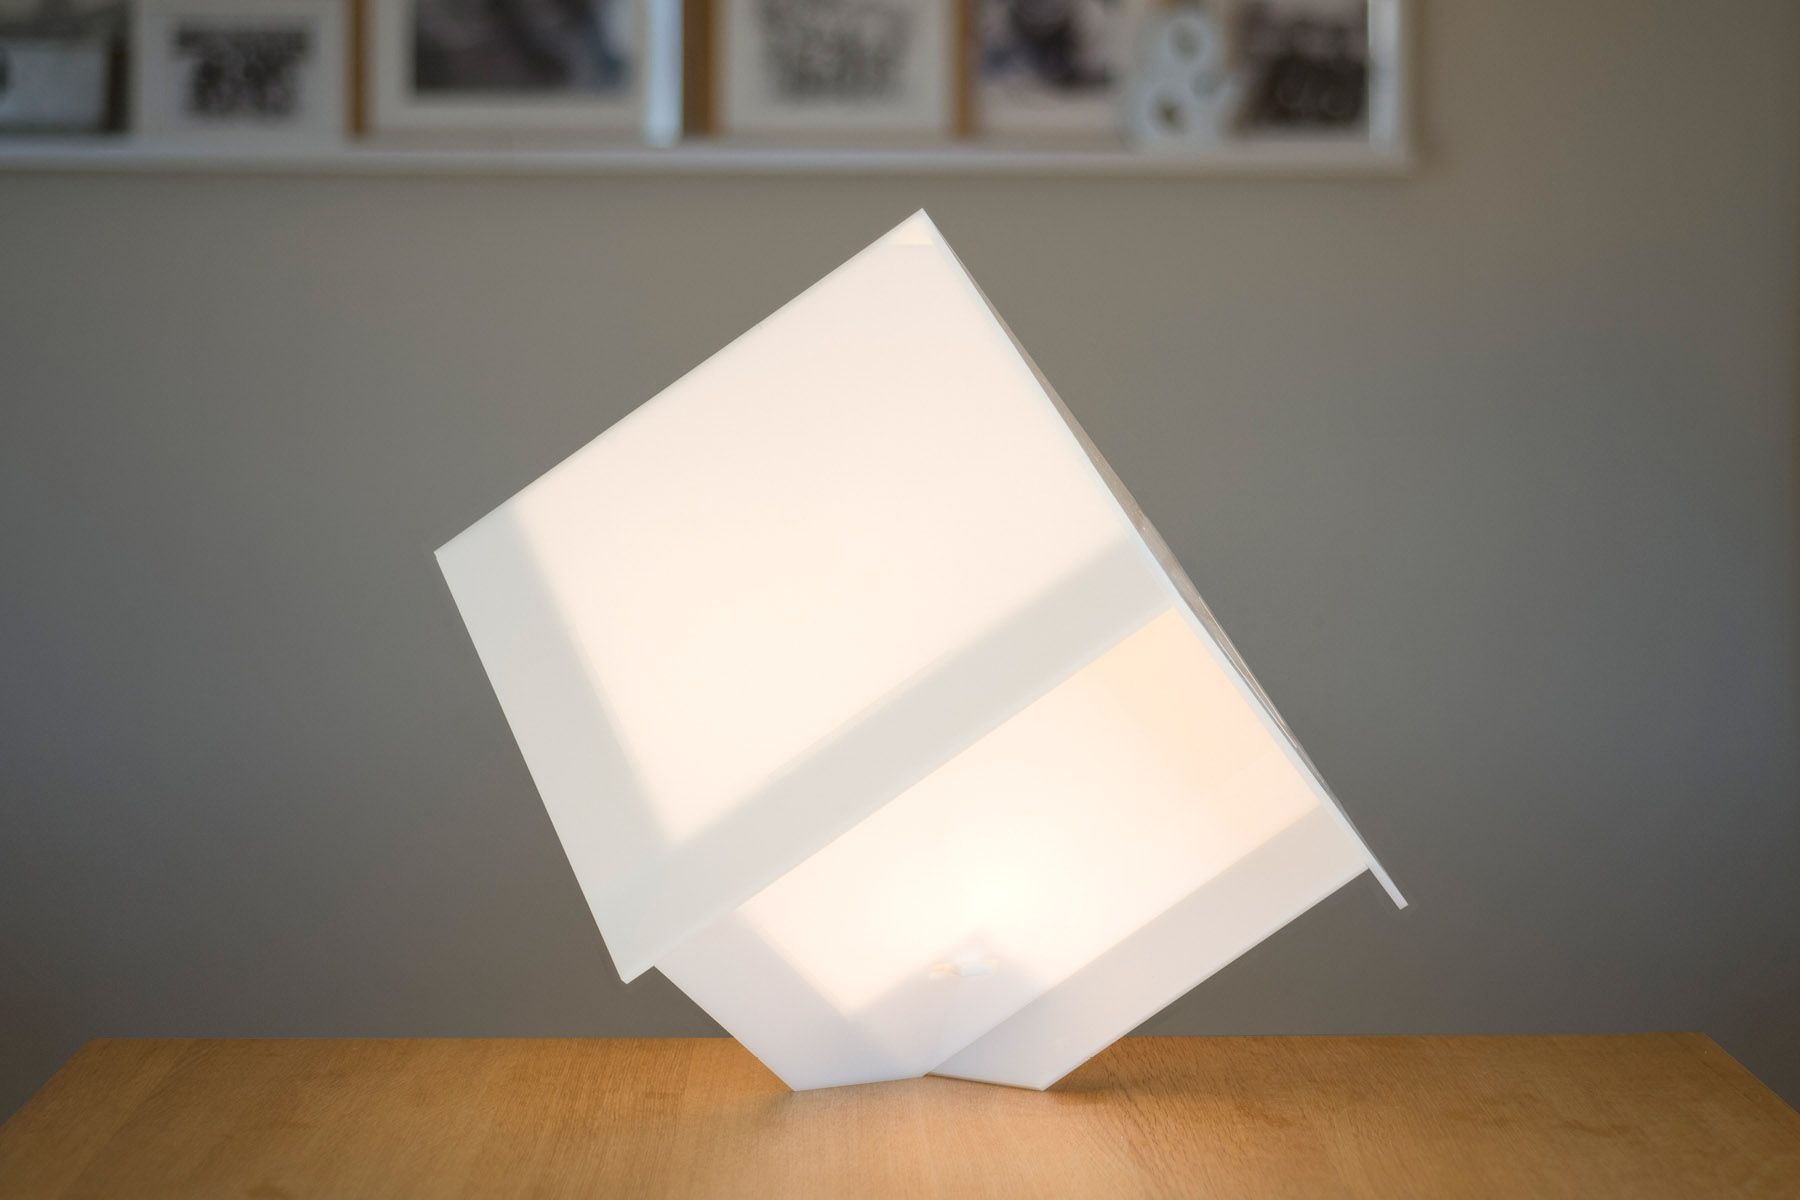 Cubic lamp on a vertex, lit